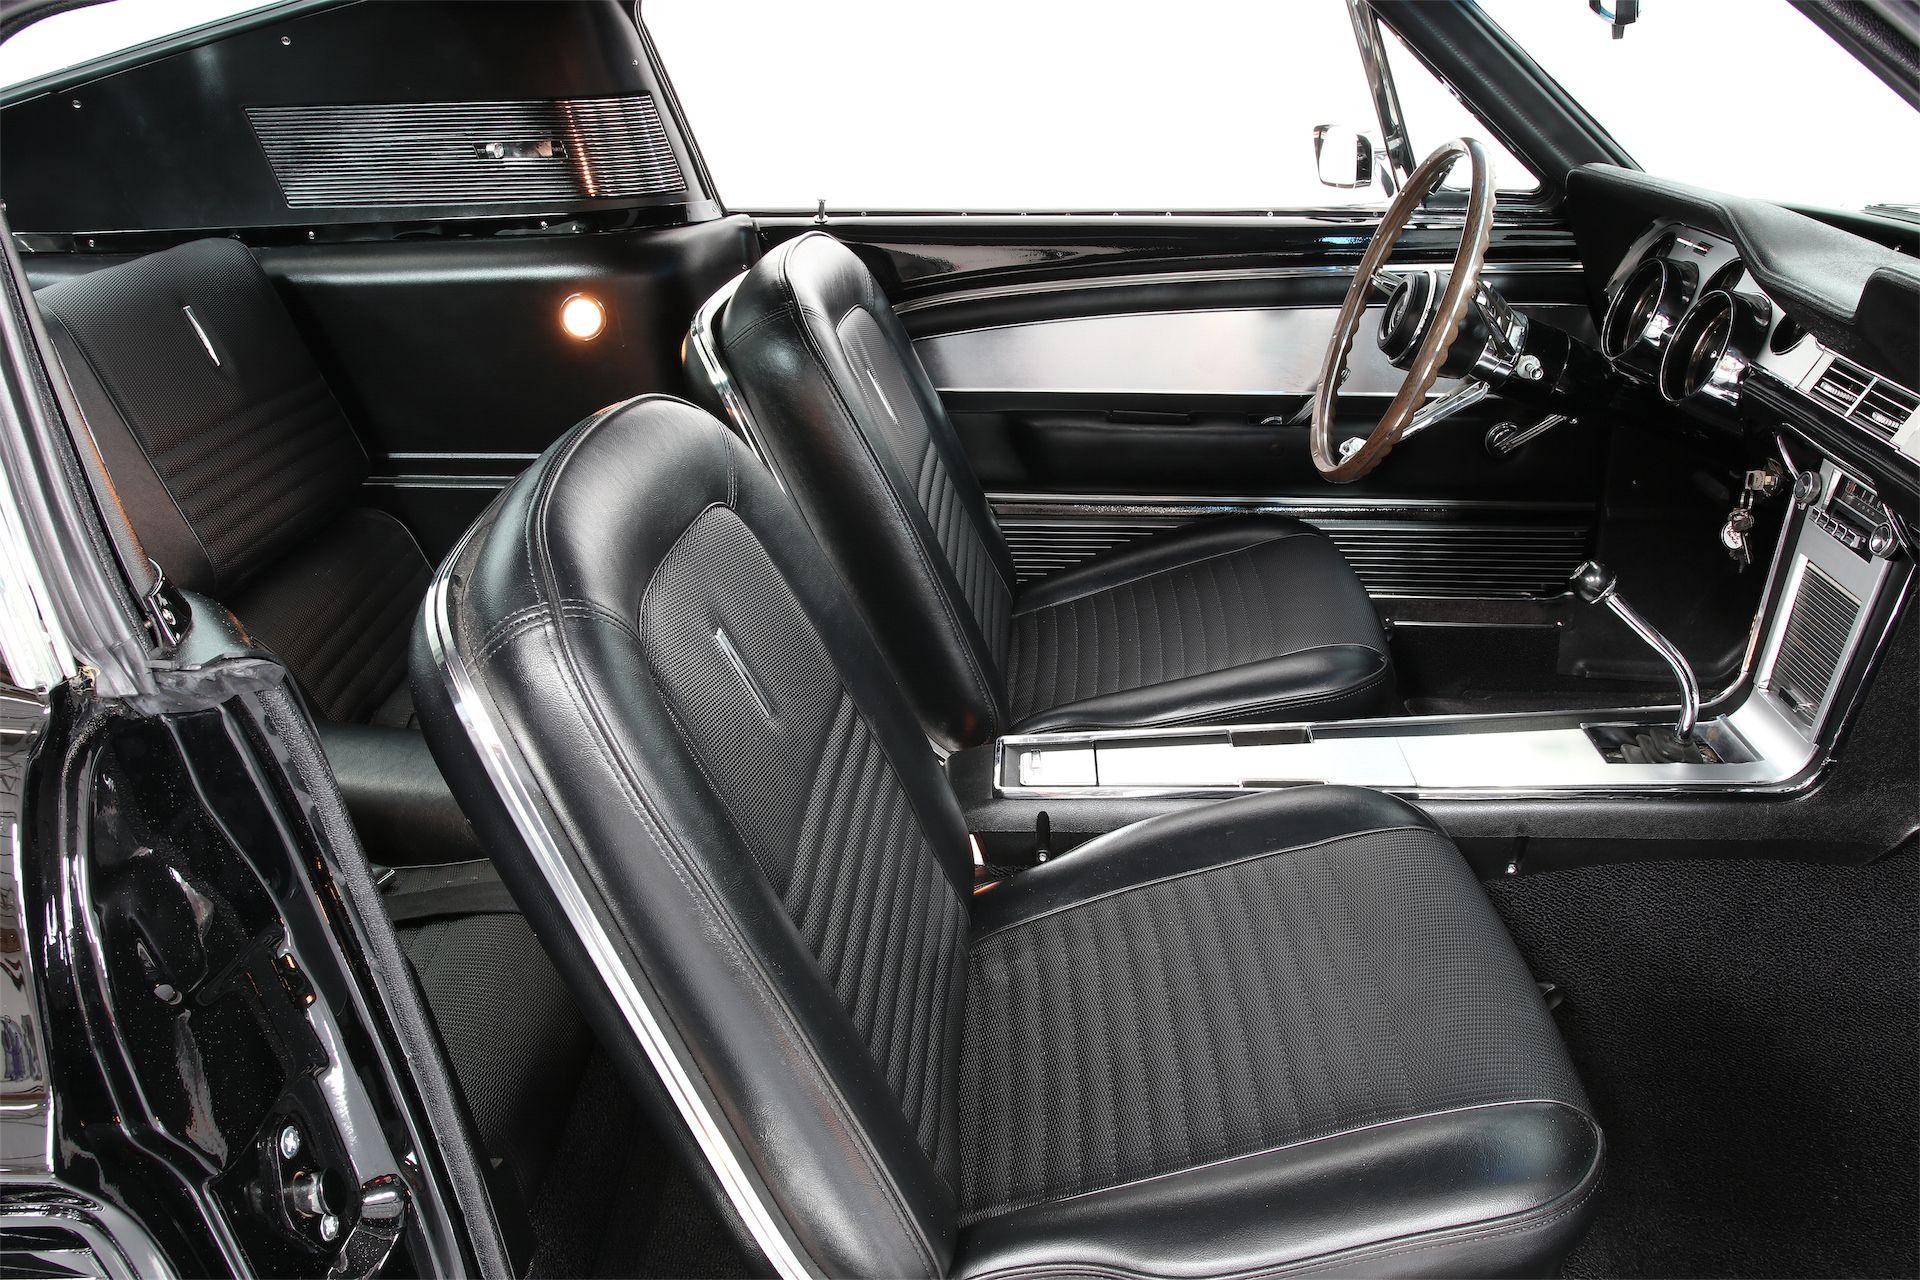 1967 Mustang Gt 390 S Code Fastback 1967 Mustang Mustang